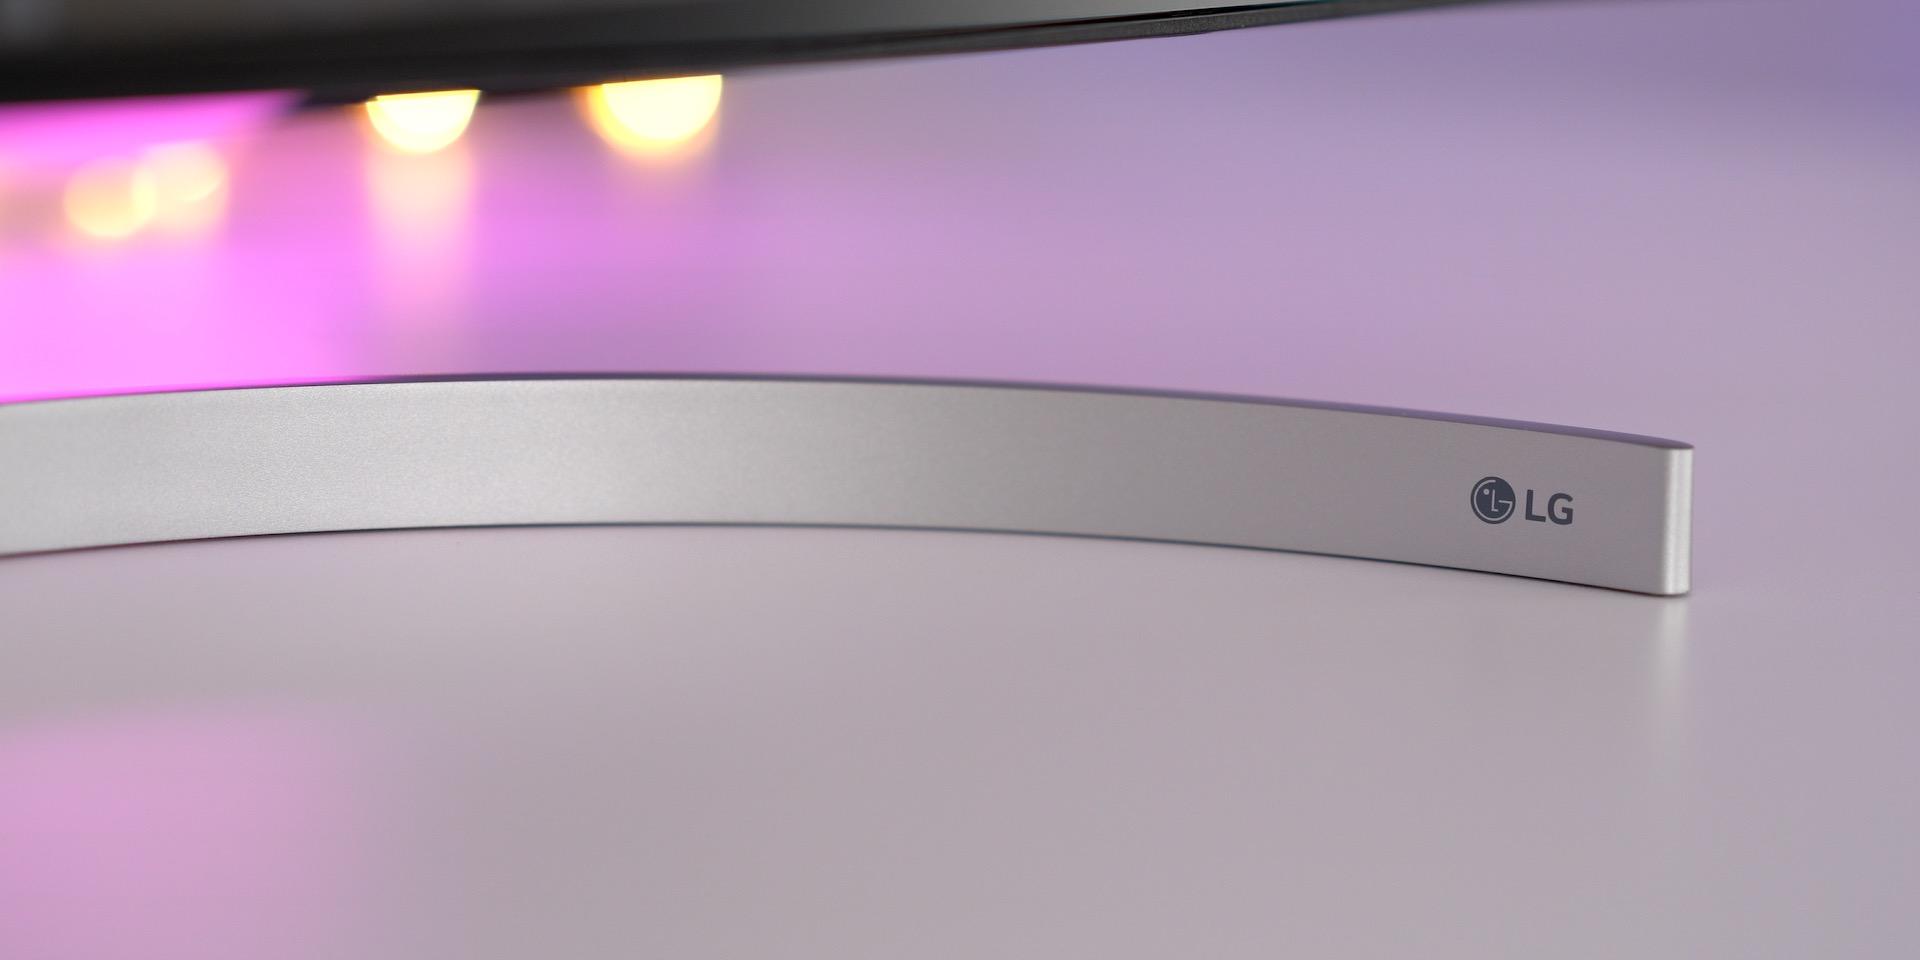 LG 32UL950 UltraFine 4K Display Review LG Logo Stand